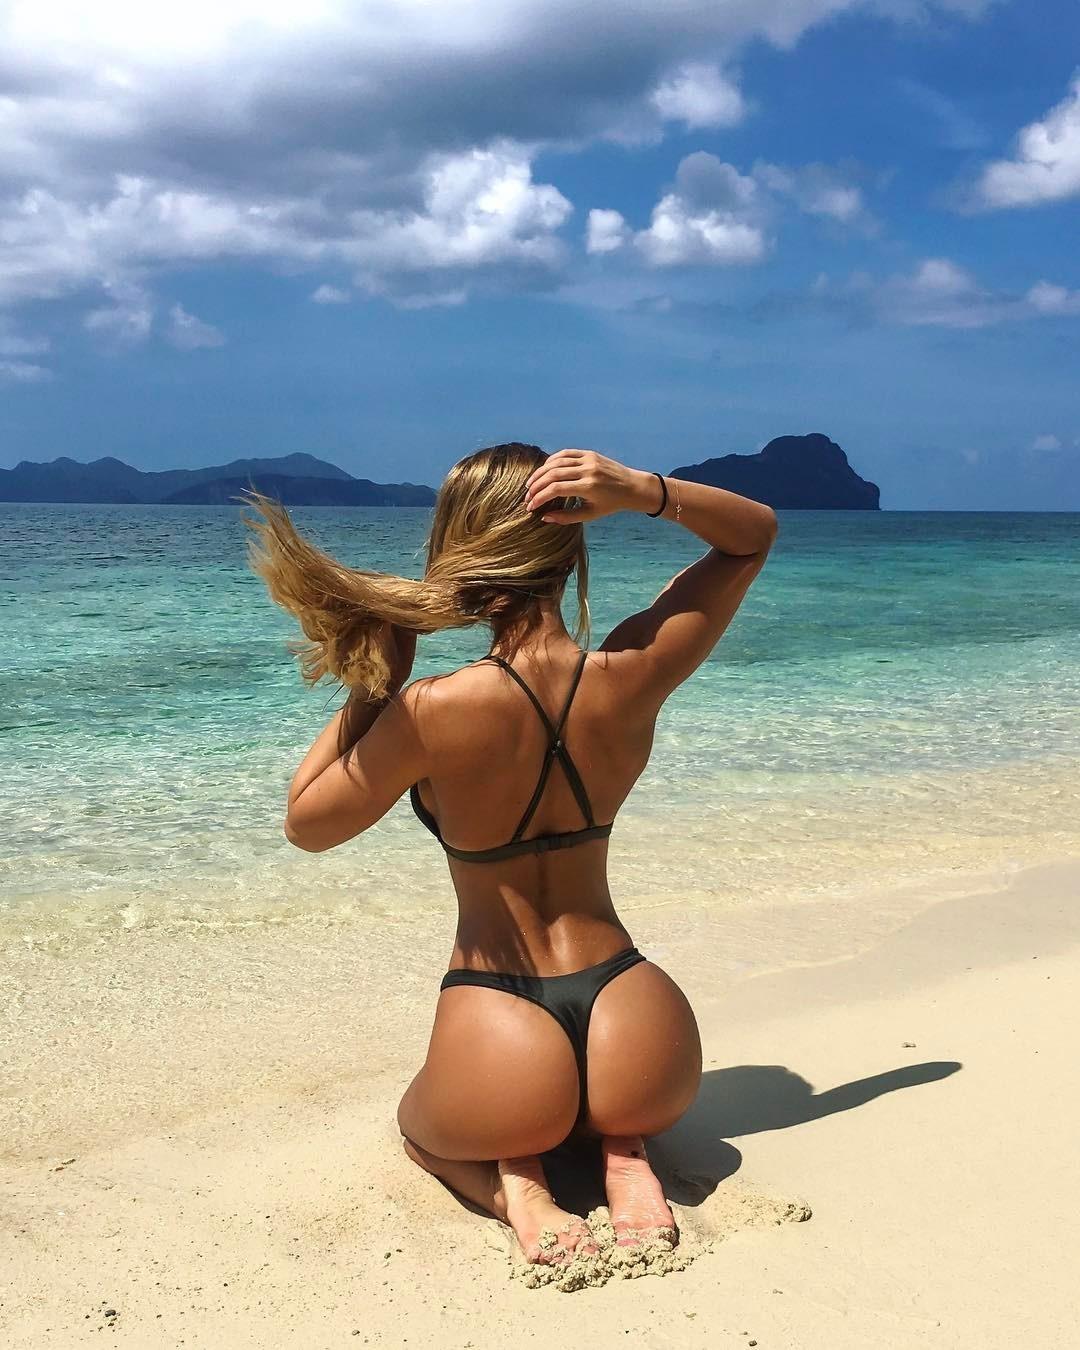 Hot mexican girls in bikinis-6356